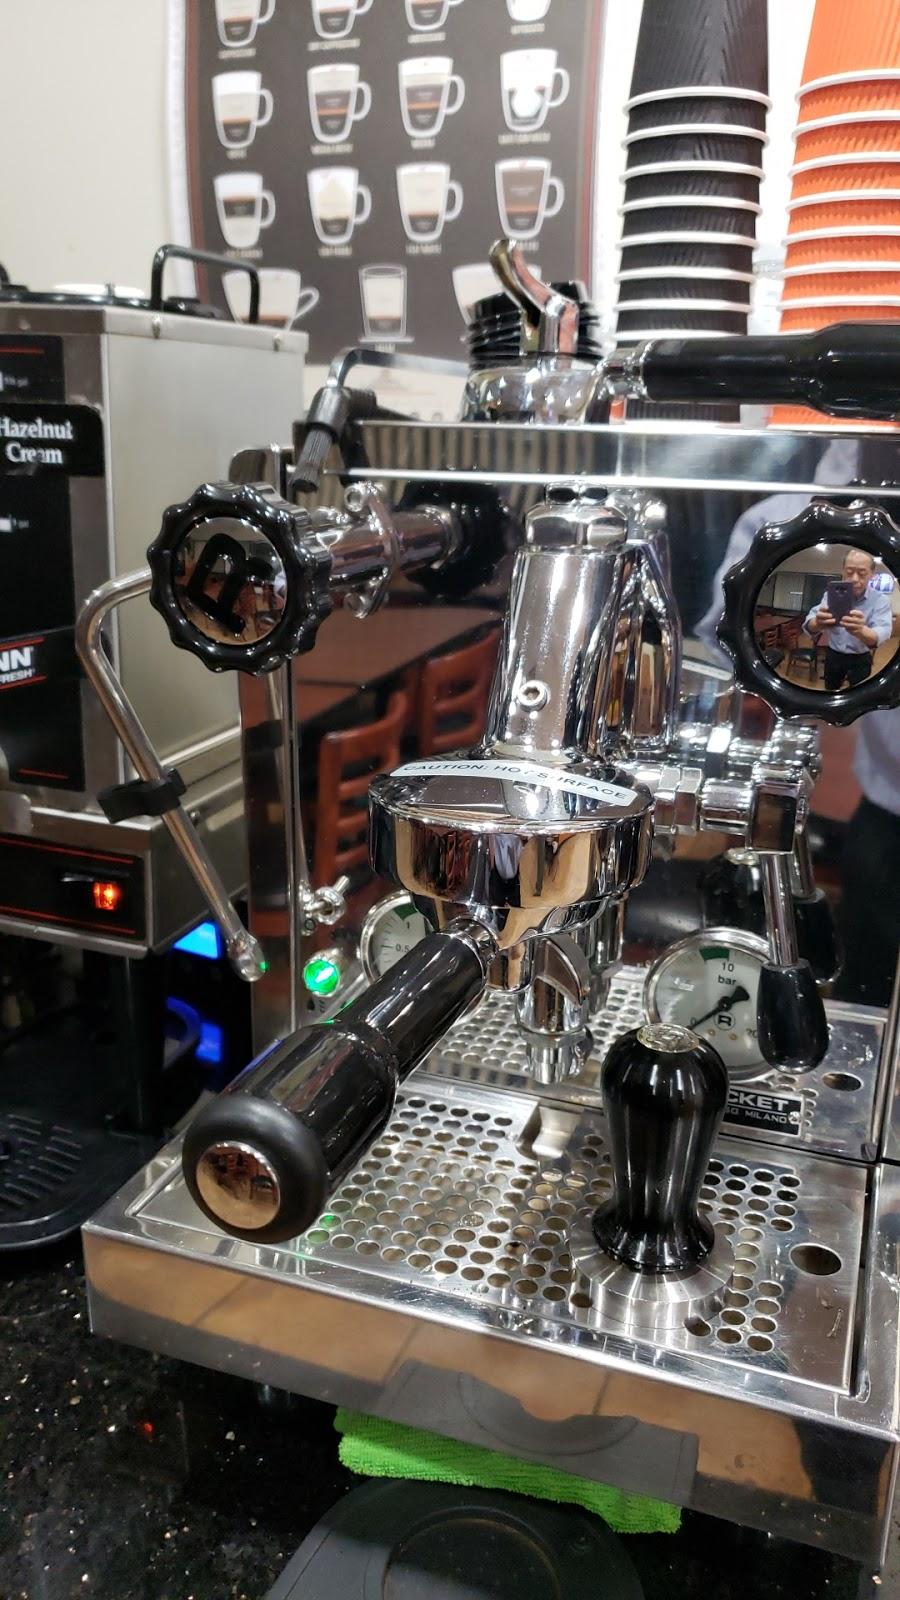 SC Uptown Cafe - cafe  | Photo 7 of 10 | Address: 10805 Parkridge Blvd STE 100, Reston, VA 20191, USA | Phone: (703) 391-8999